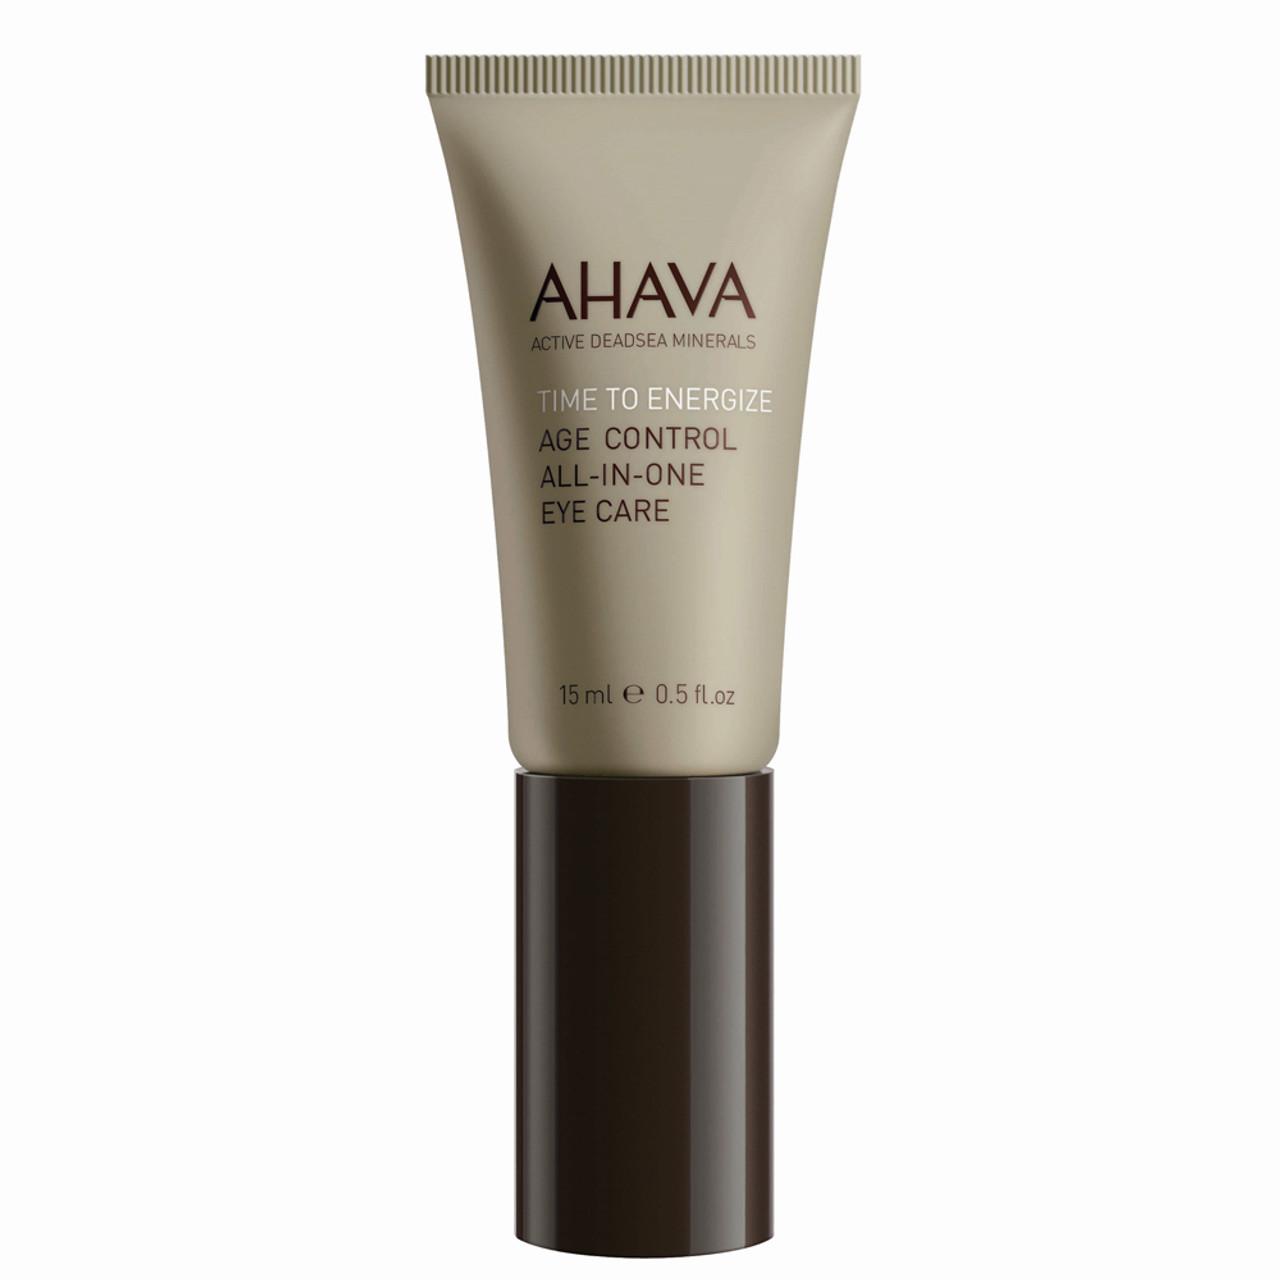 AHAVA Mens Age Control All-In-One Eye Care BeautifiedYou.com